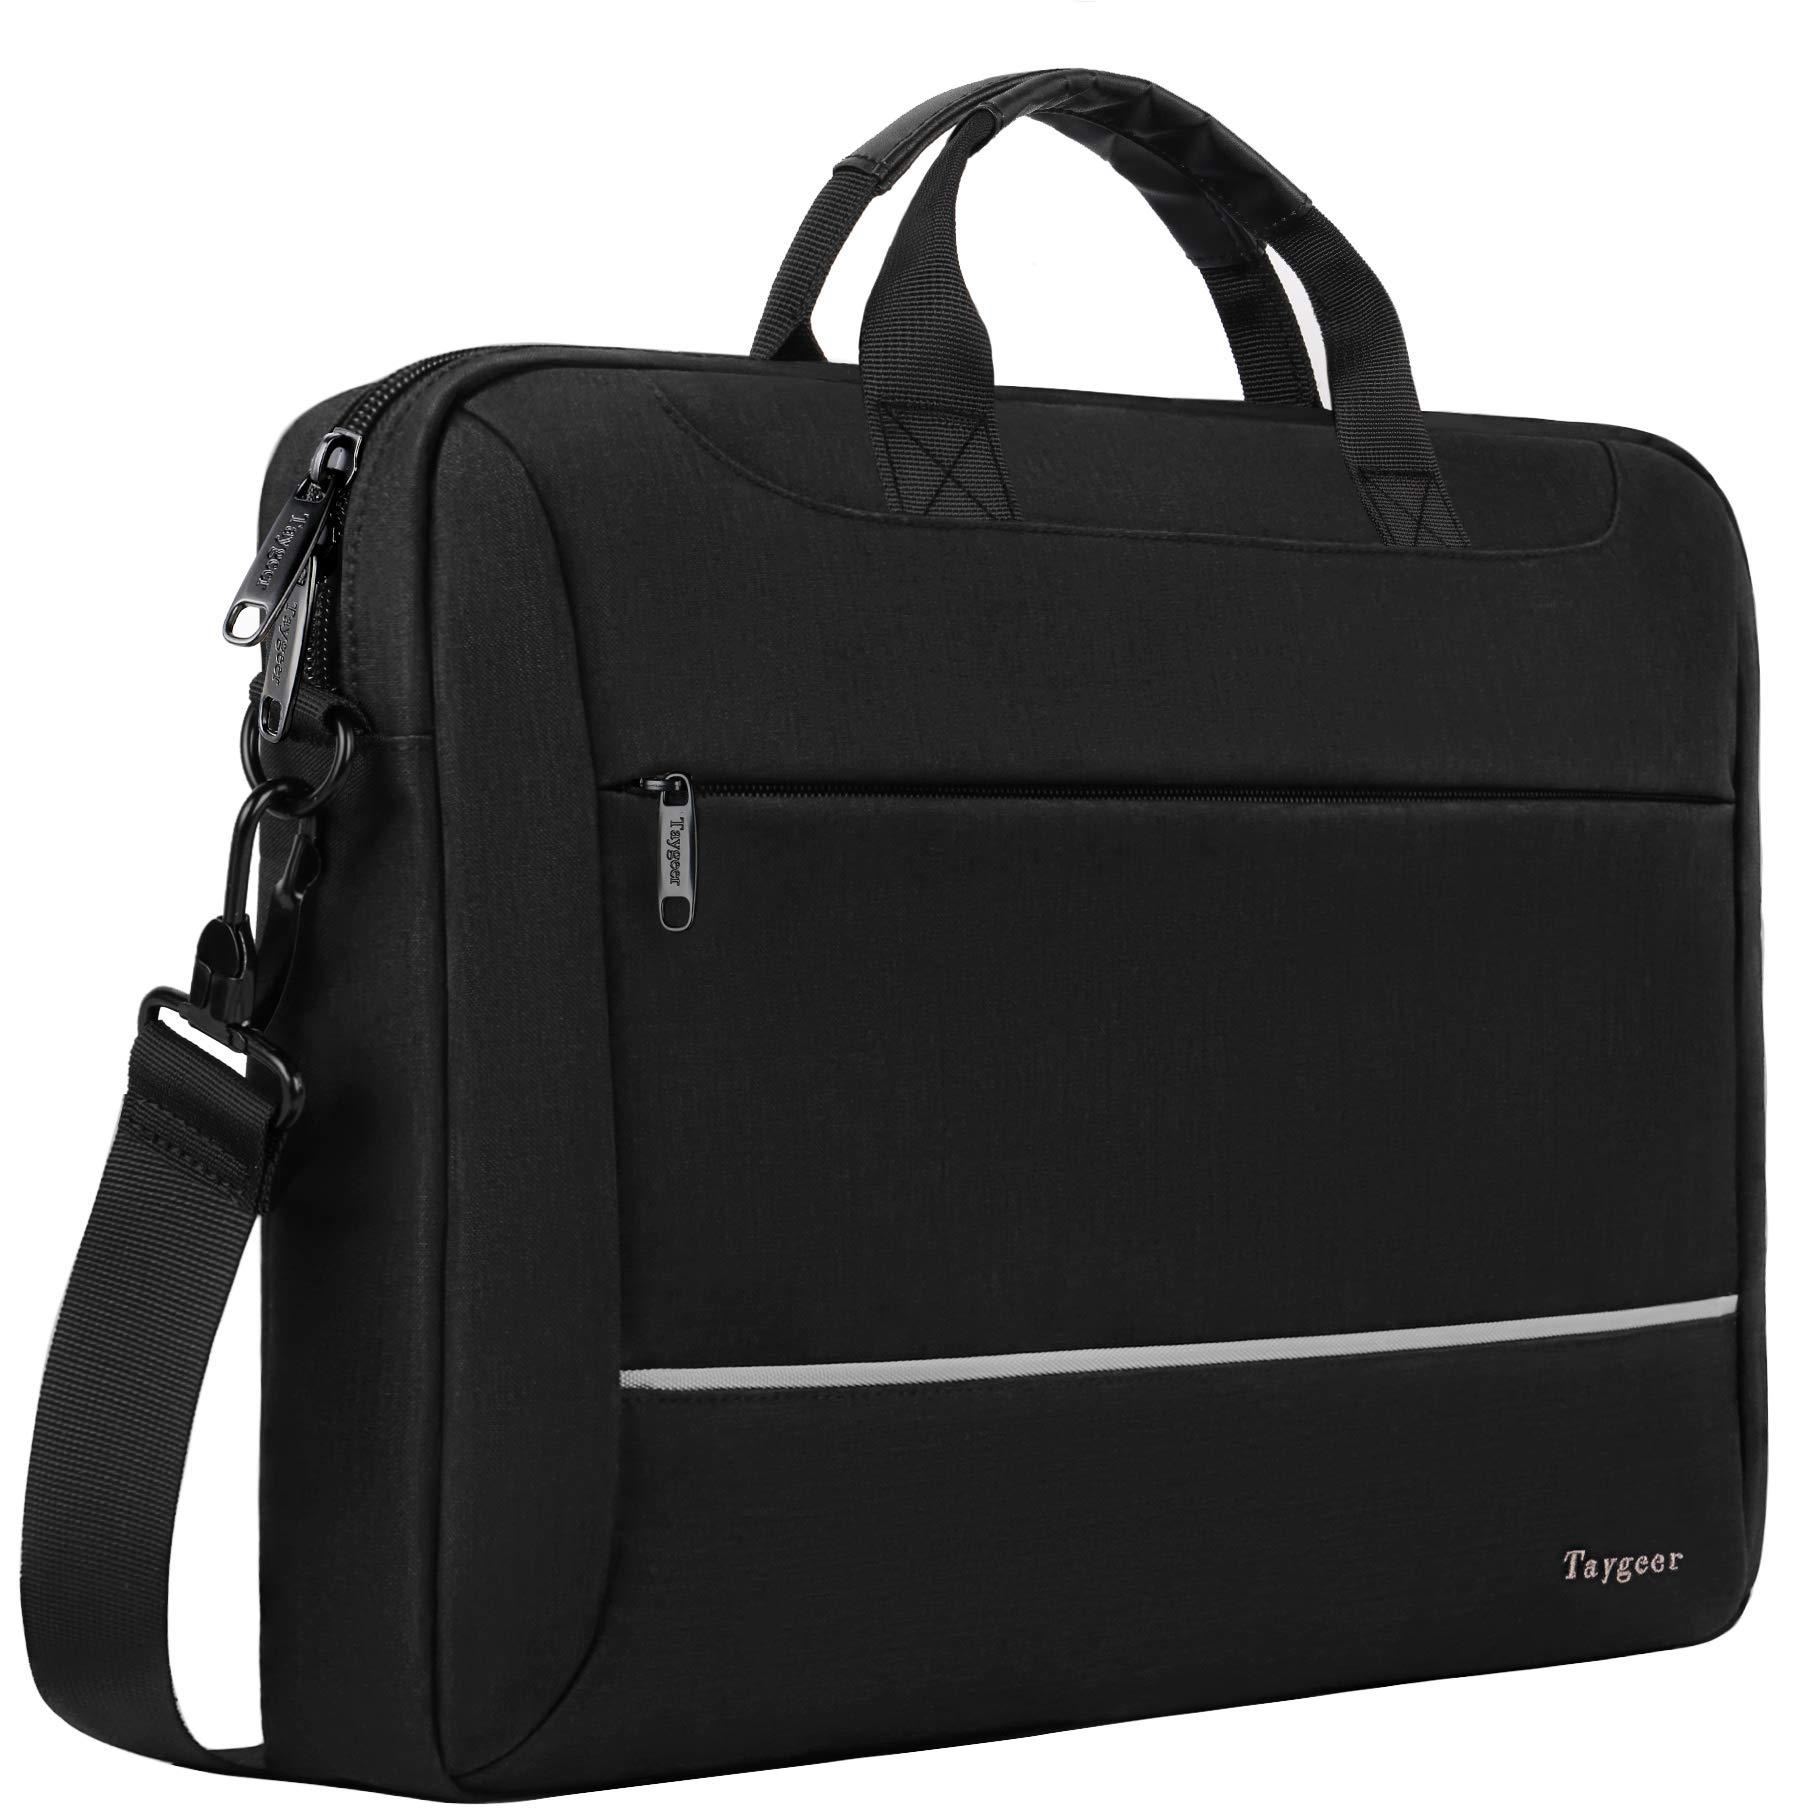 Laptop Bag 15.6 inch, Slim Laptop Briefcase for Men Women, Business Portable Carrying Case Computer Shoulder Bag, 15 Laptop Tablet Attache Compatible with HP/Dell/Lenovo/Asus/Microsoft Surface, Black